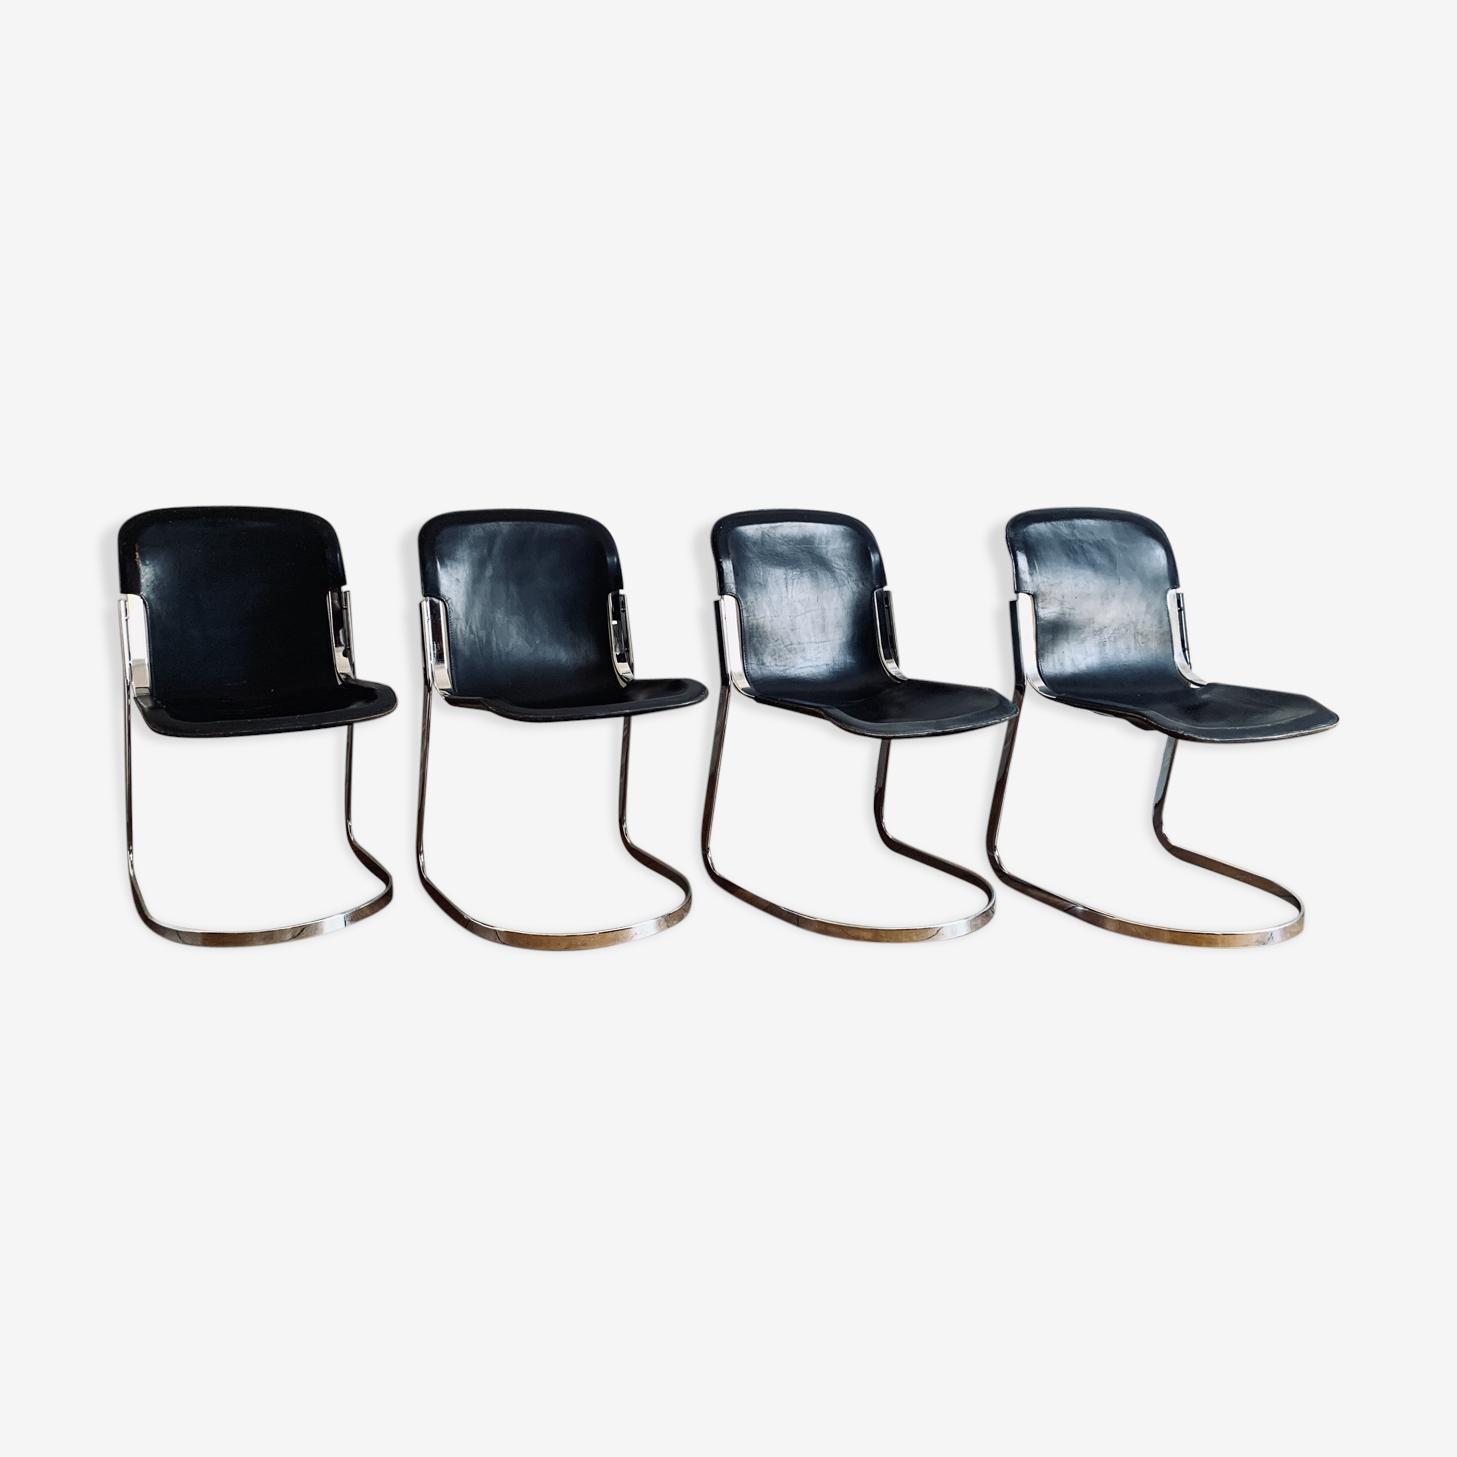 Cidue chairs